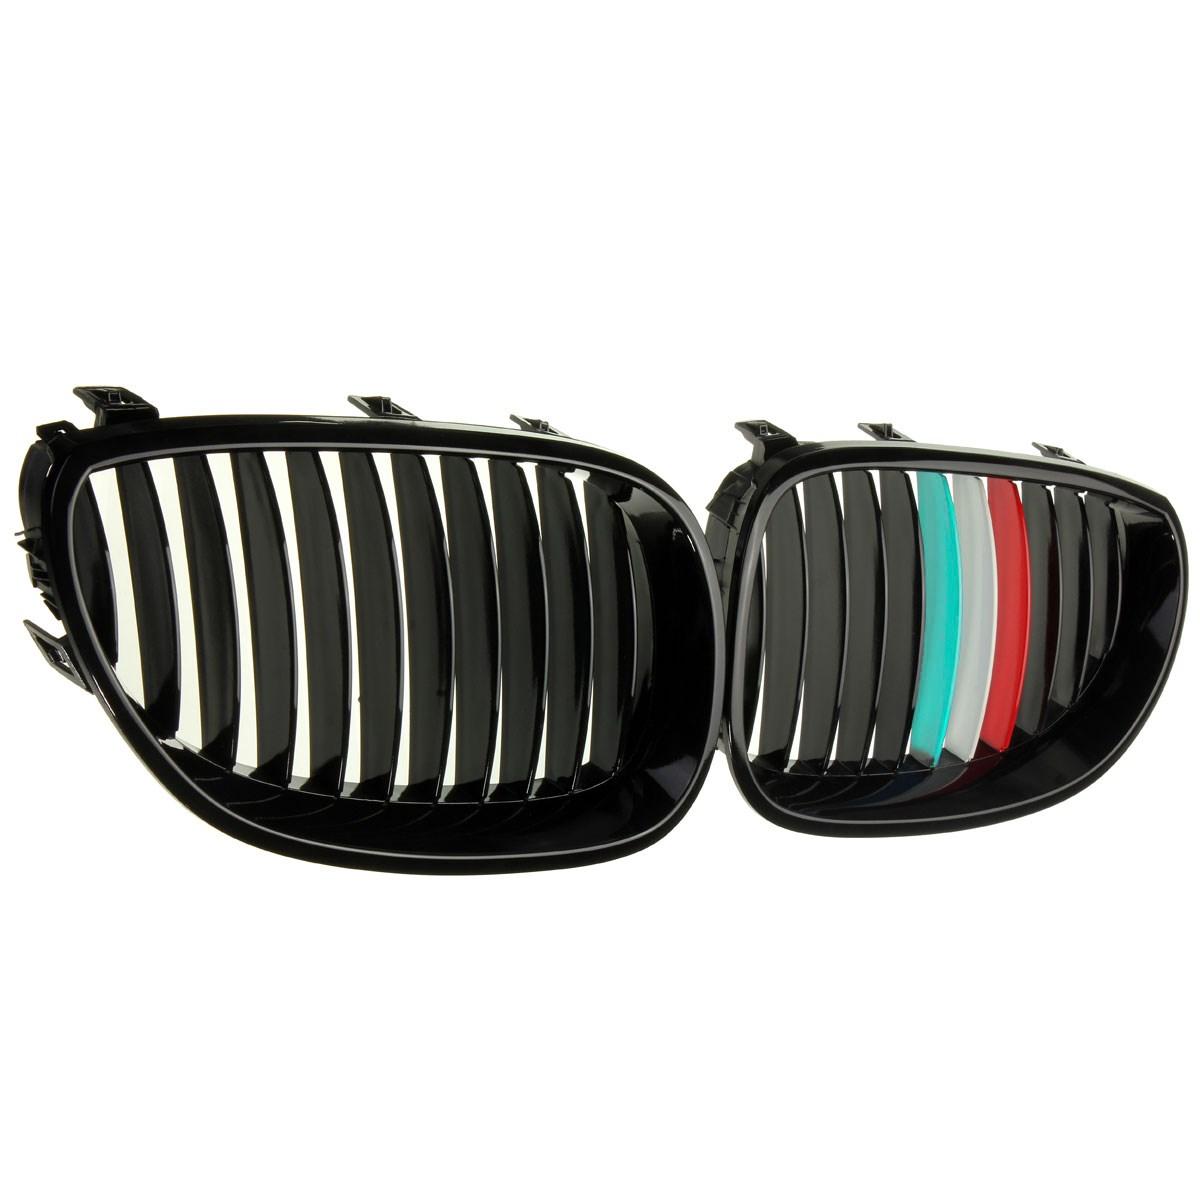 Передние решетки и накладки на радиаторы For BMW E60 1 + + BMW E60 E61 5 2003/2009 new best price 5 meters lan cable for bmw gt1 for bmw ops